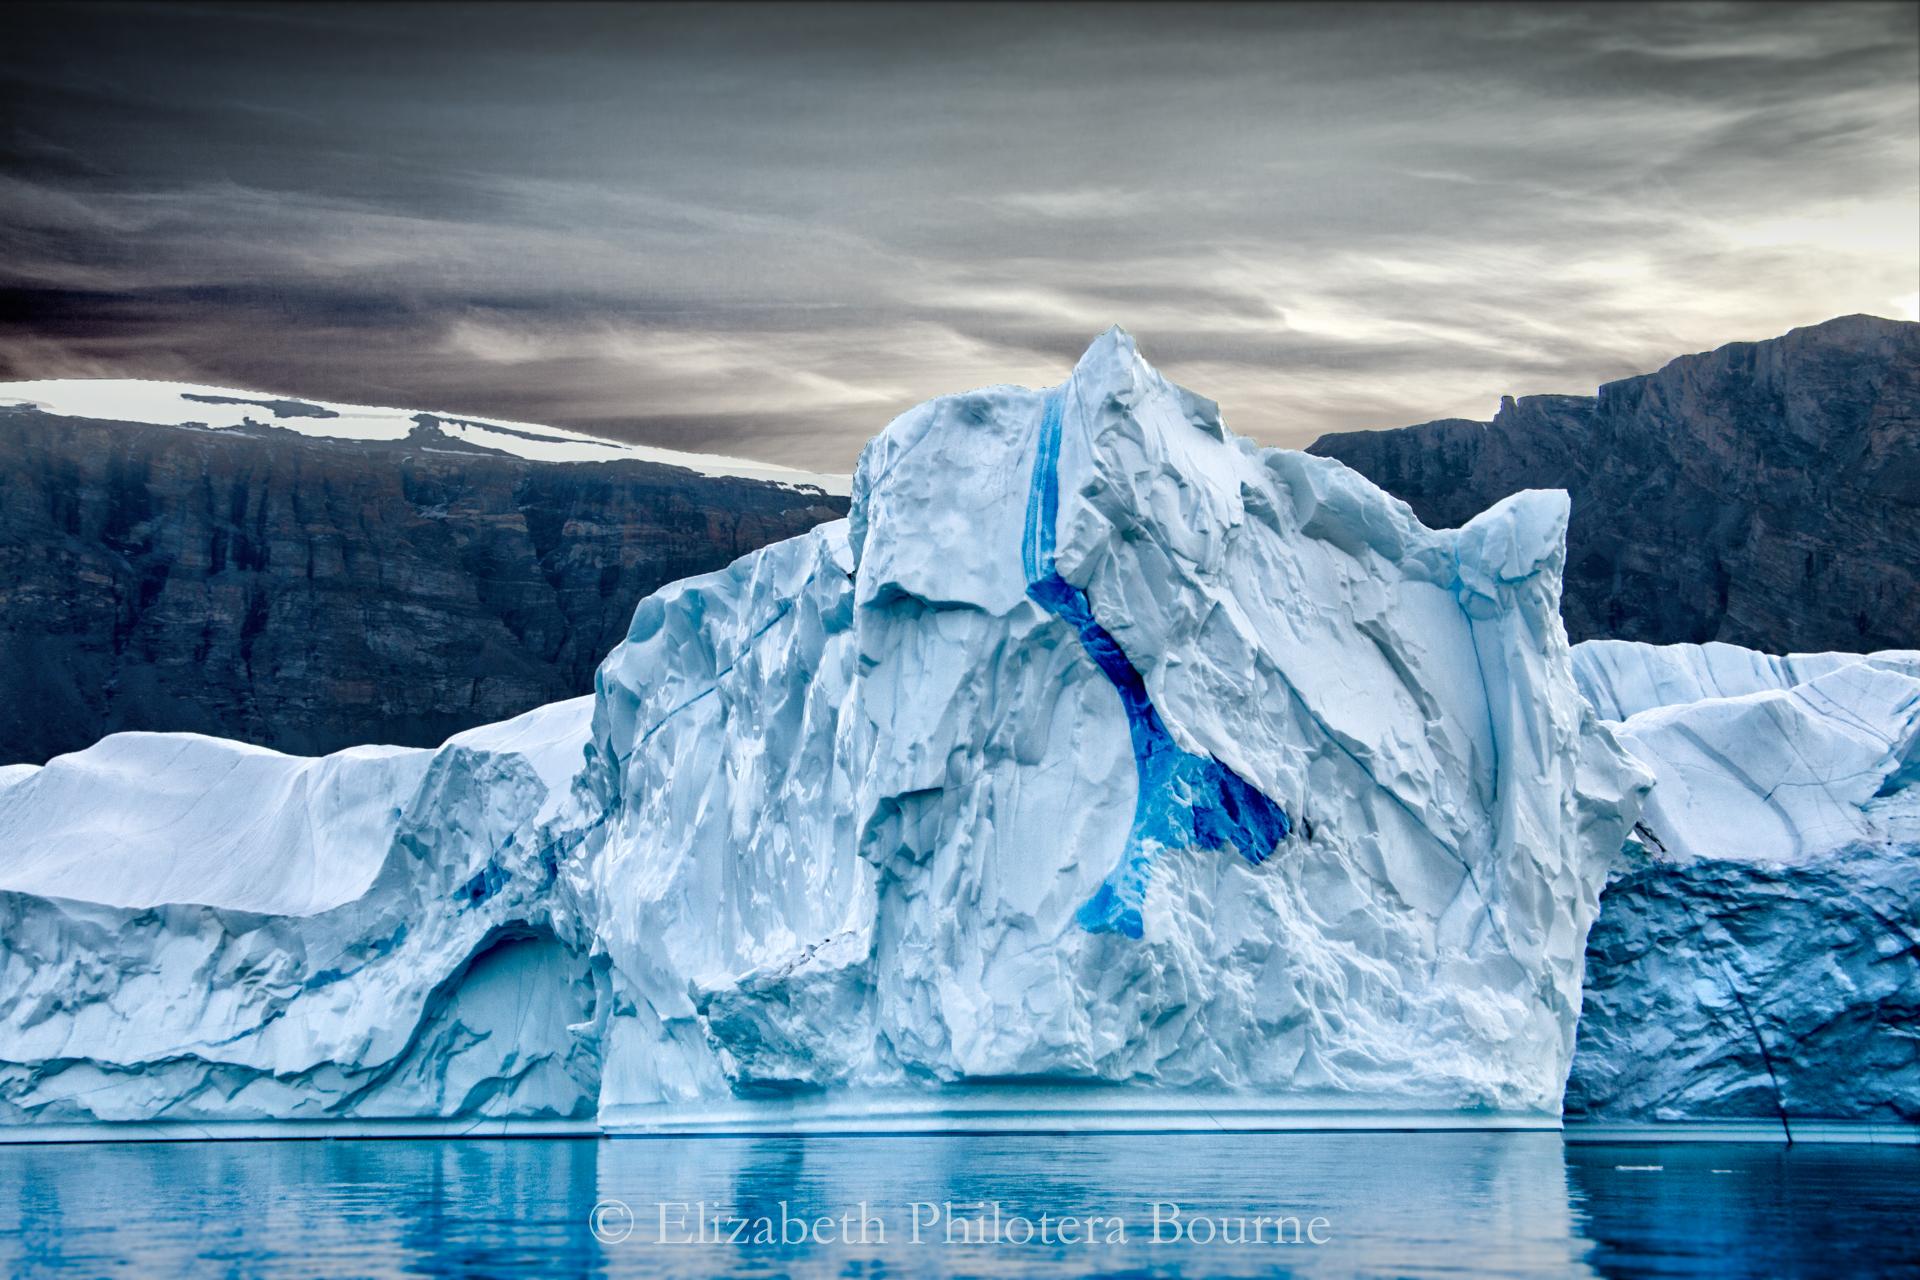 Blue iceber wit intense blue veining floating against dark rocky cliffs and gray sky